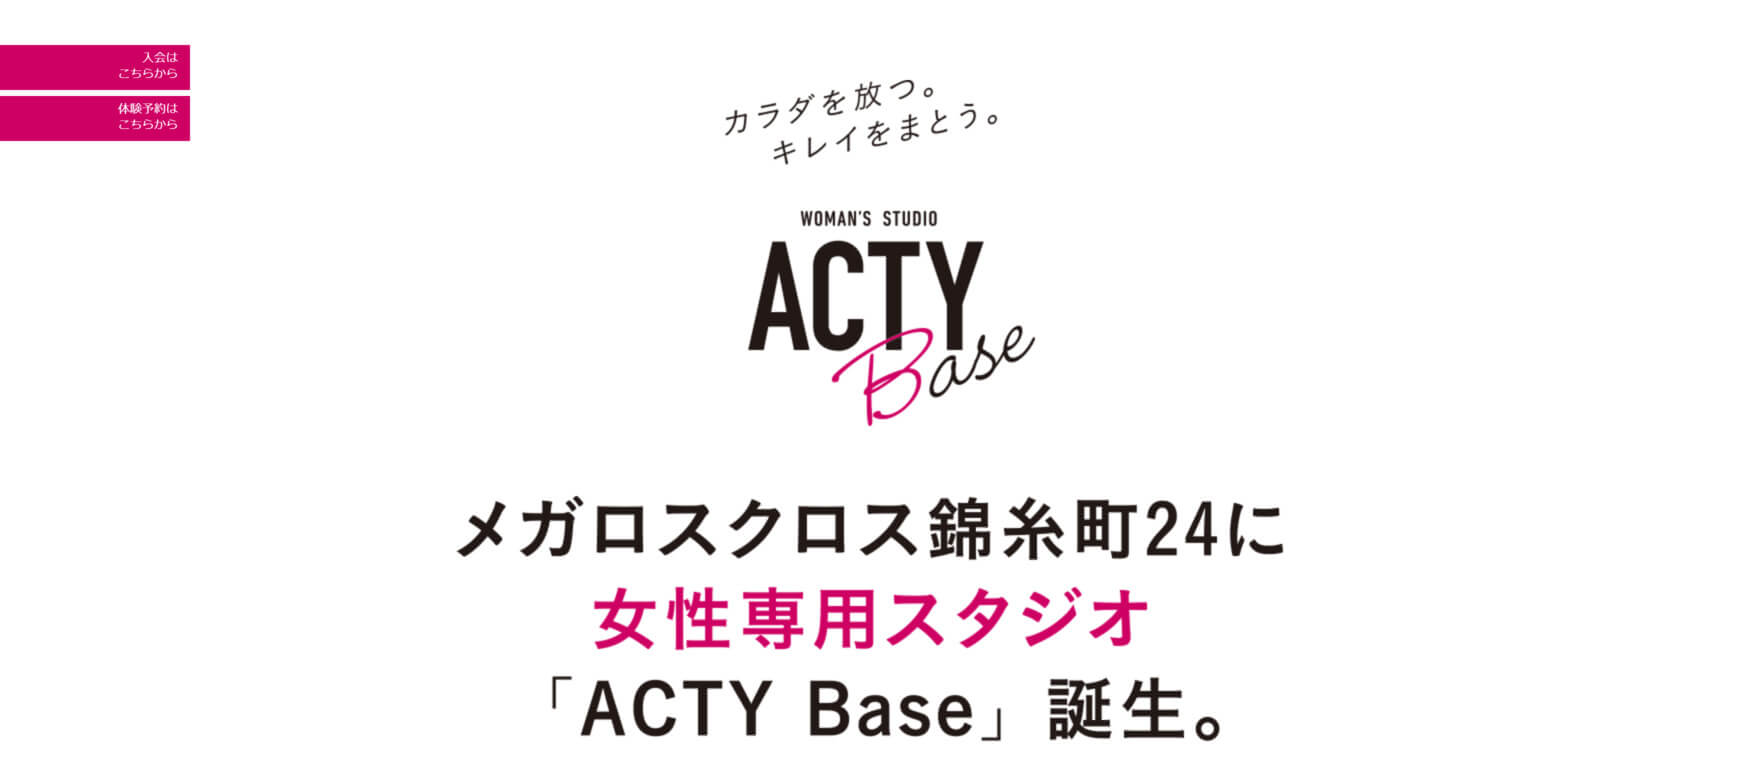 ACTY Base錦糸町のイメージ画像